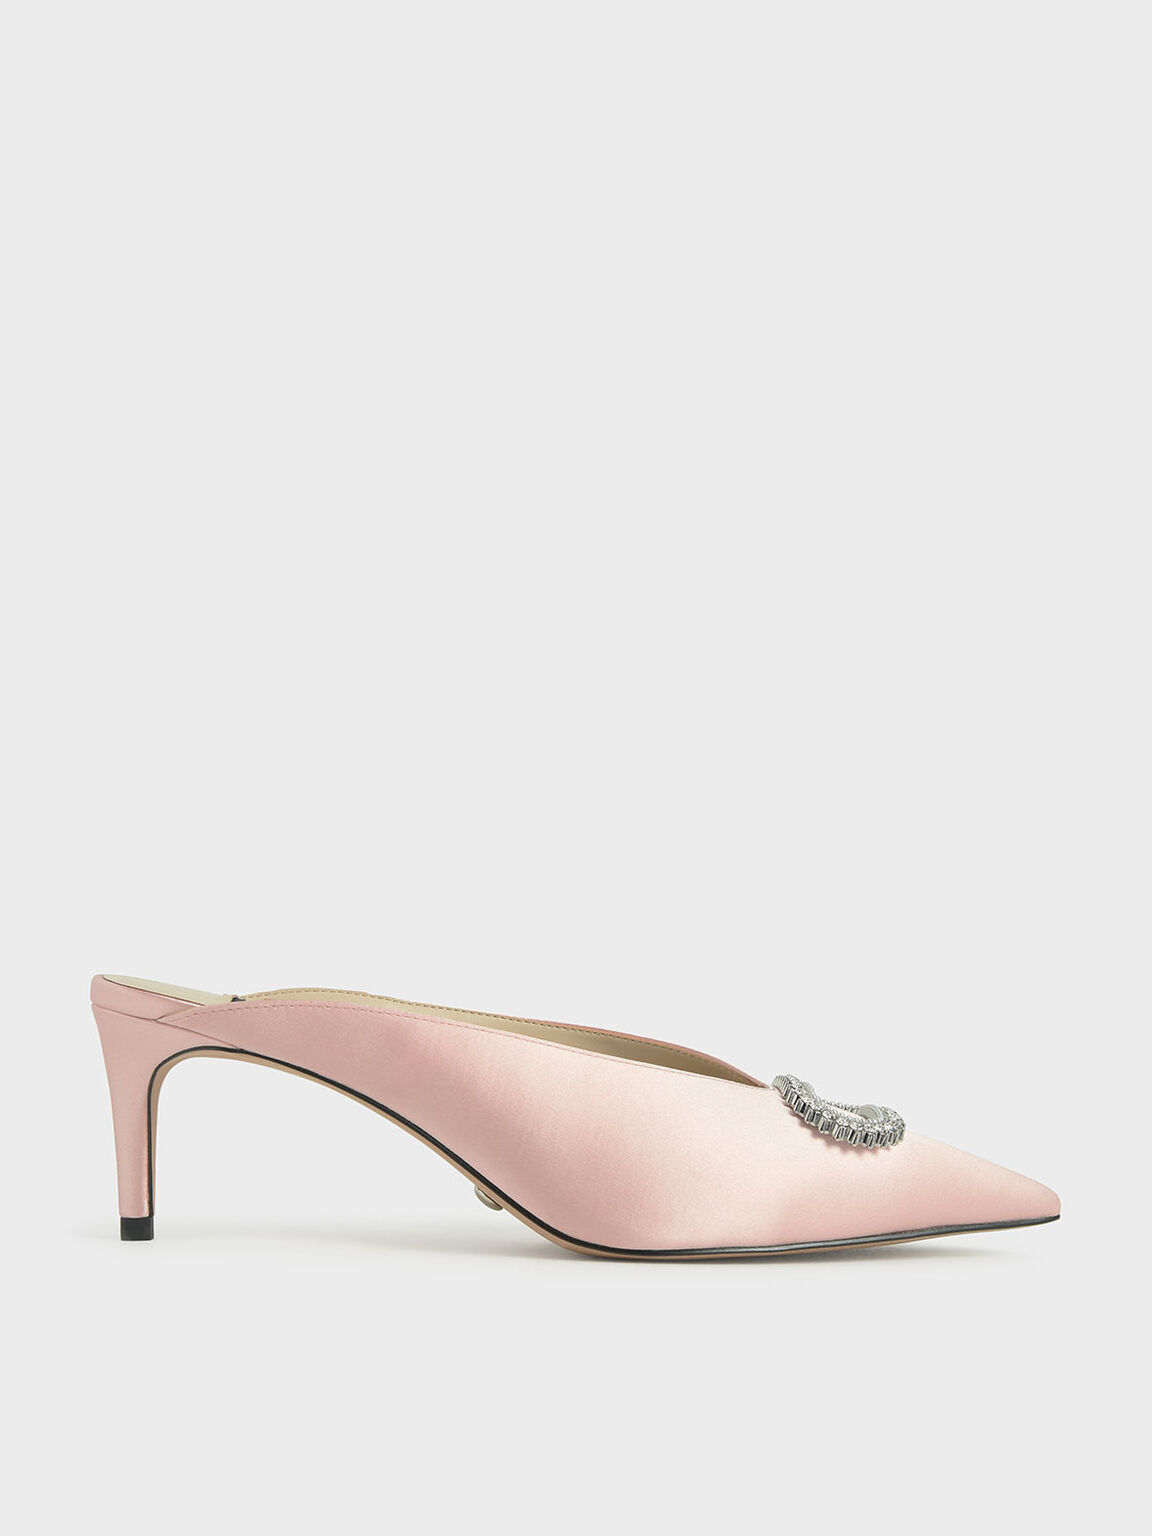 Wedding Collection: Satin Embellished Mules, Pink, hi-res